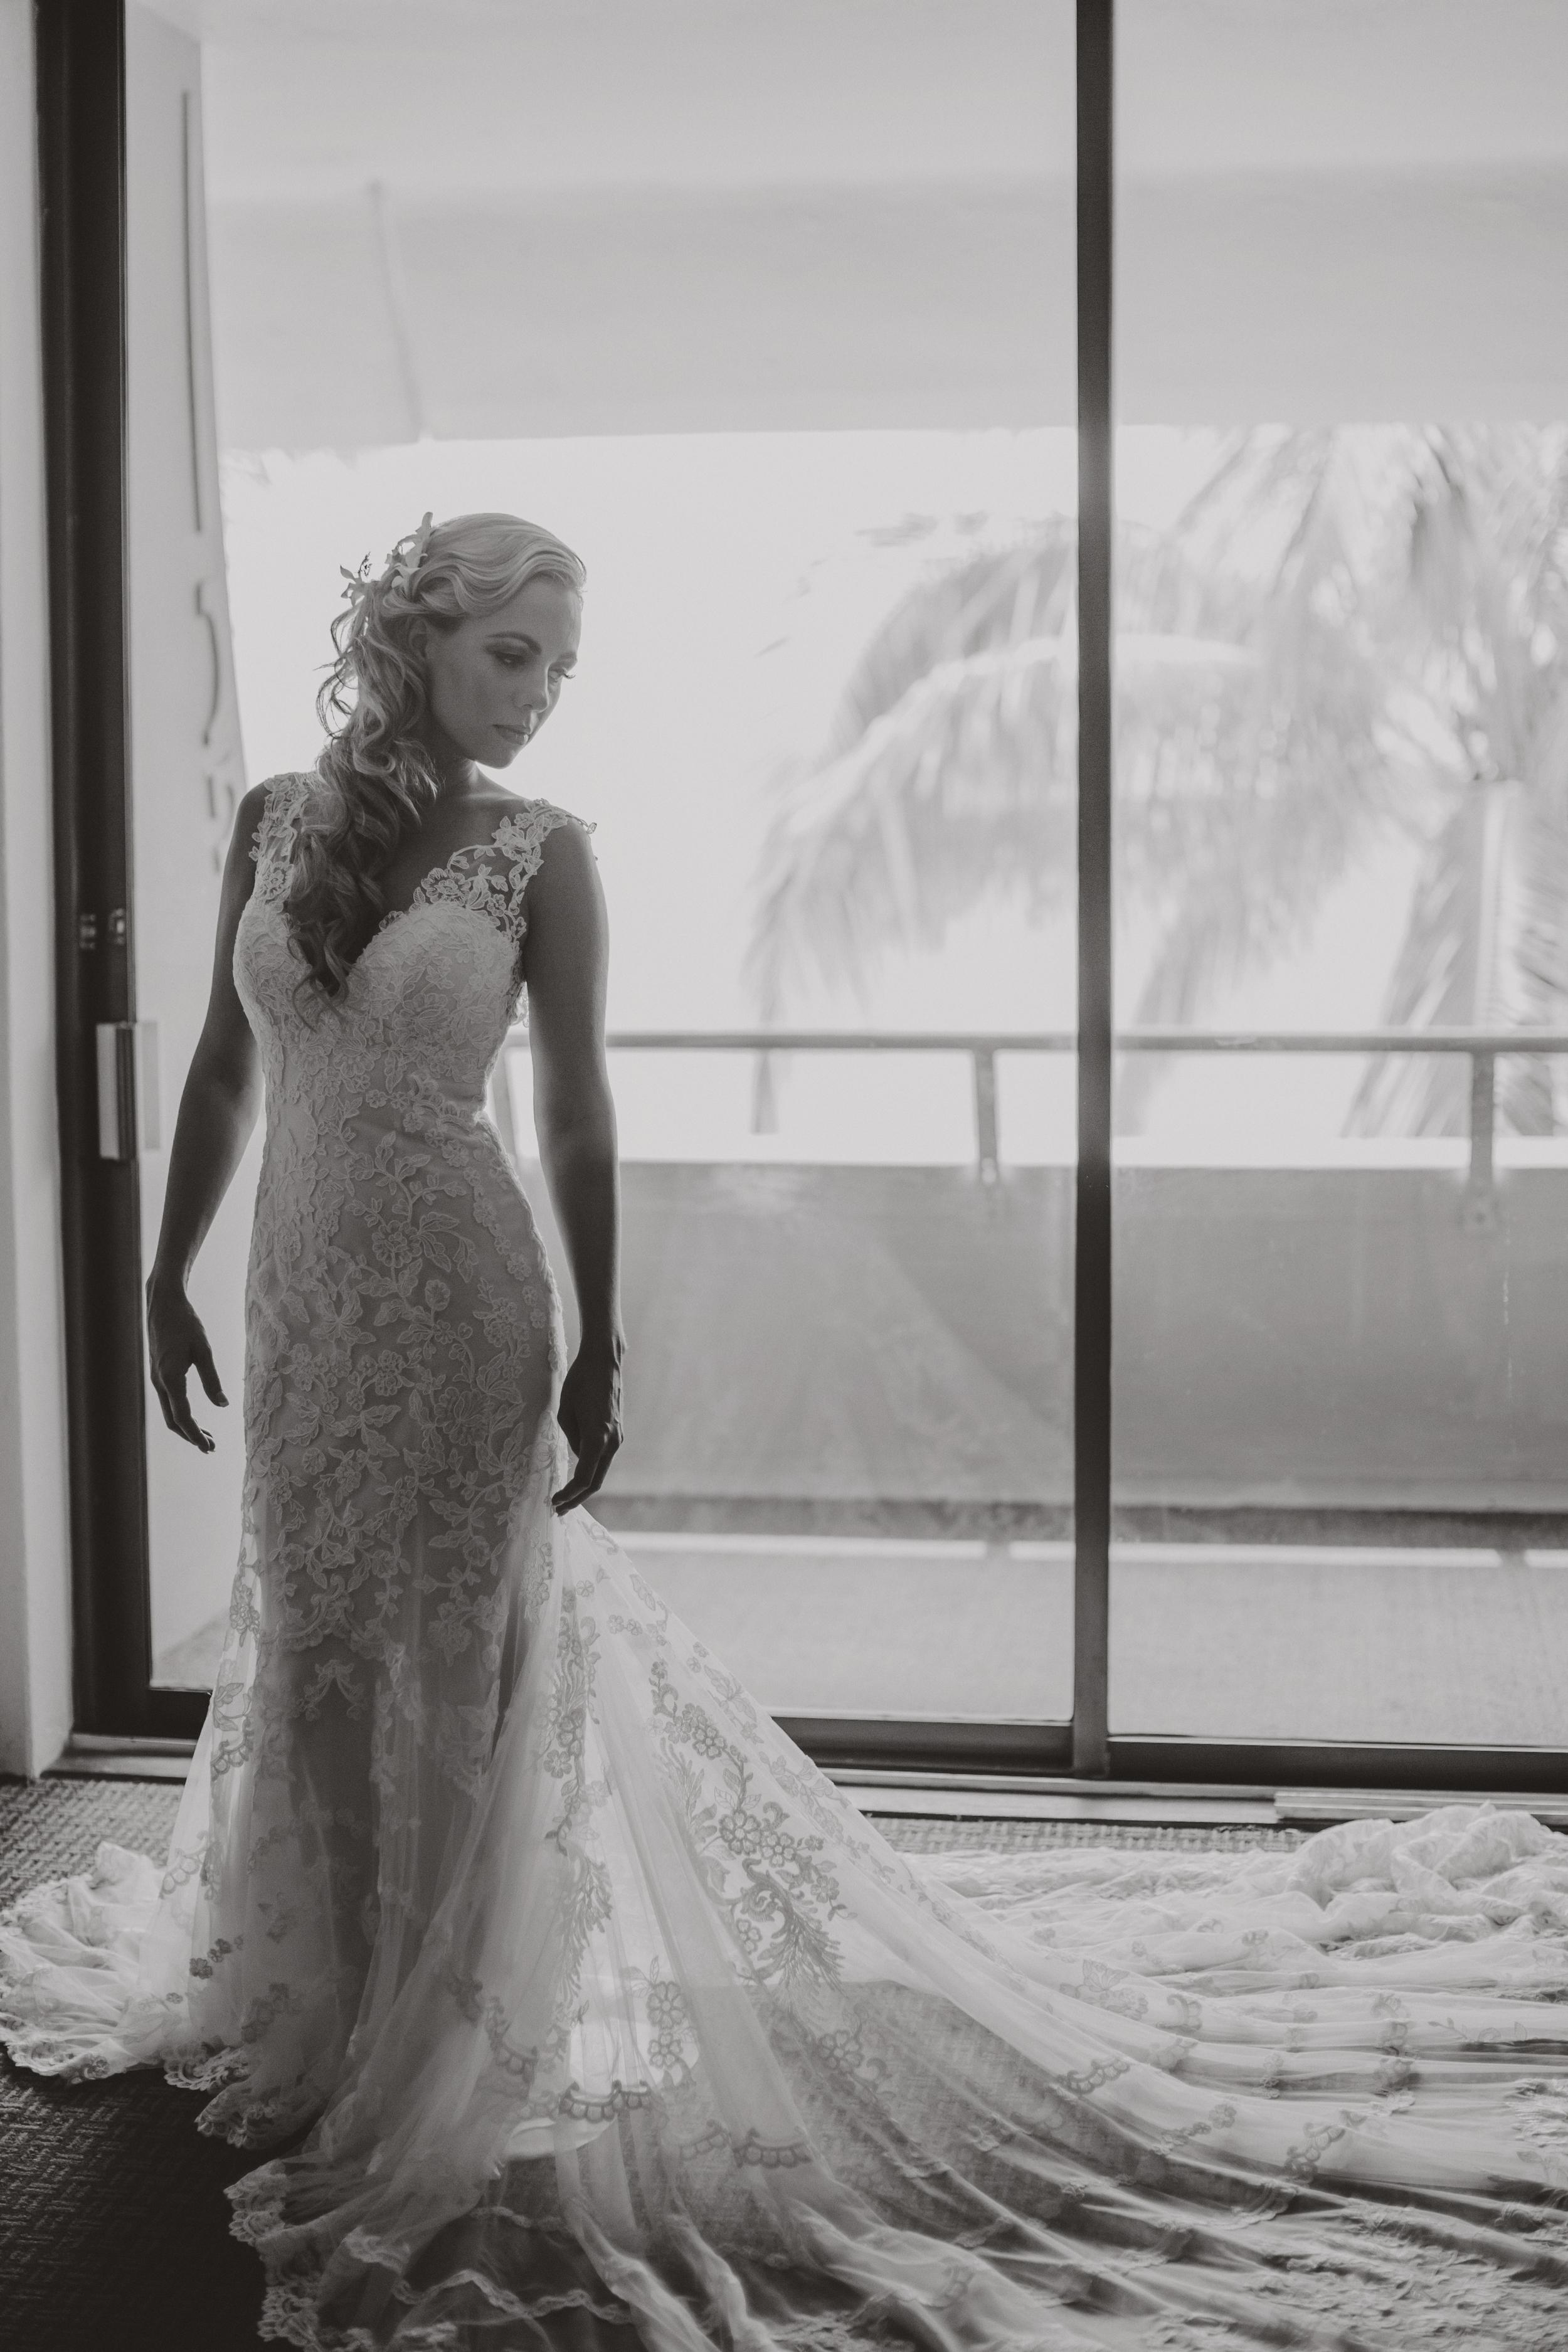 angie-diaz-photography-hawaii-wedding-photographer-kelli-jay-21.jpg